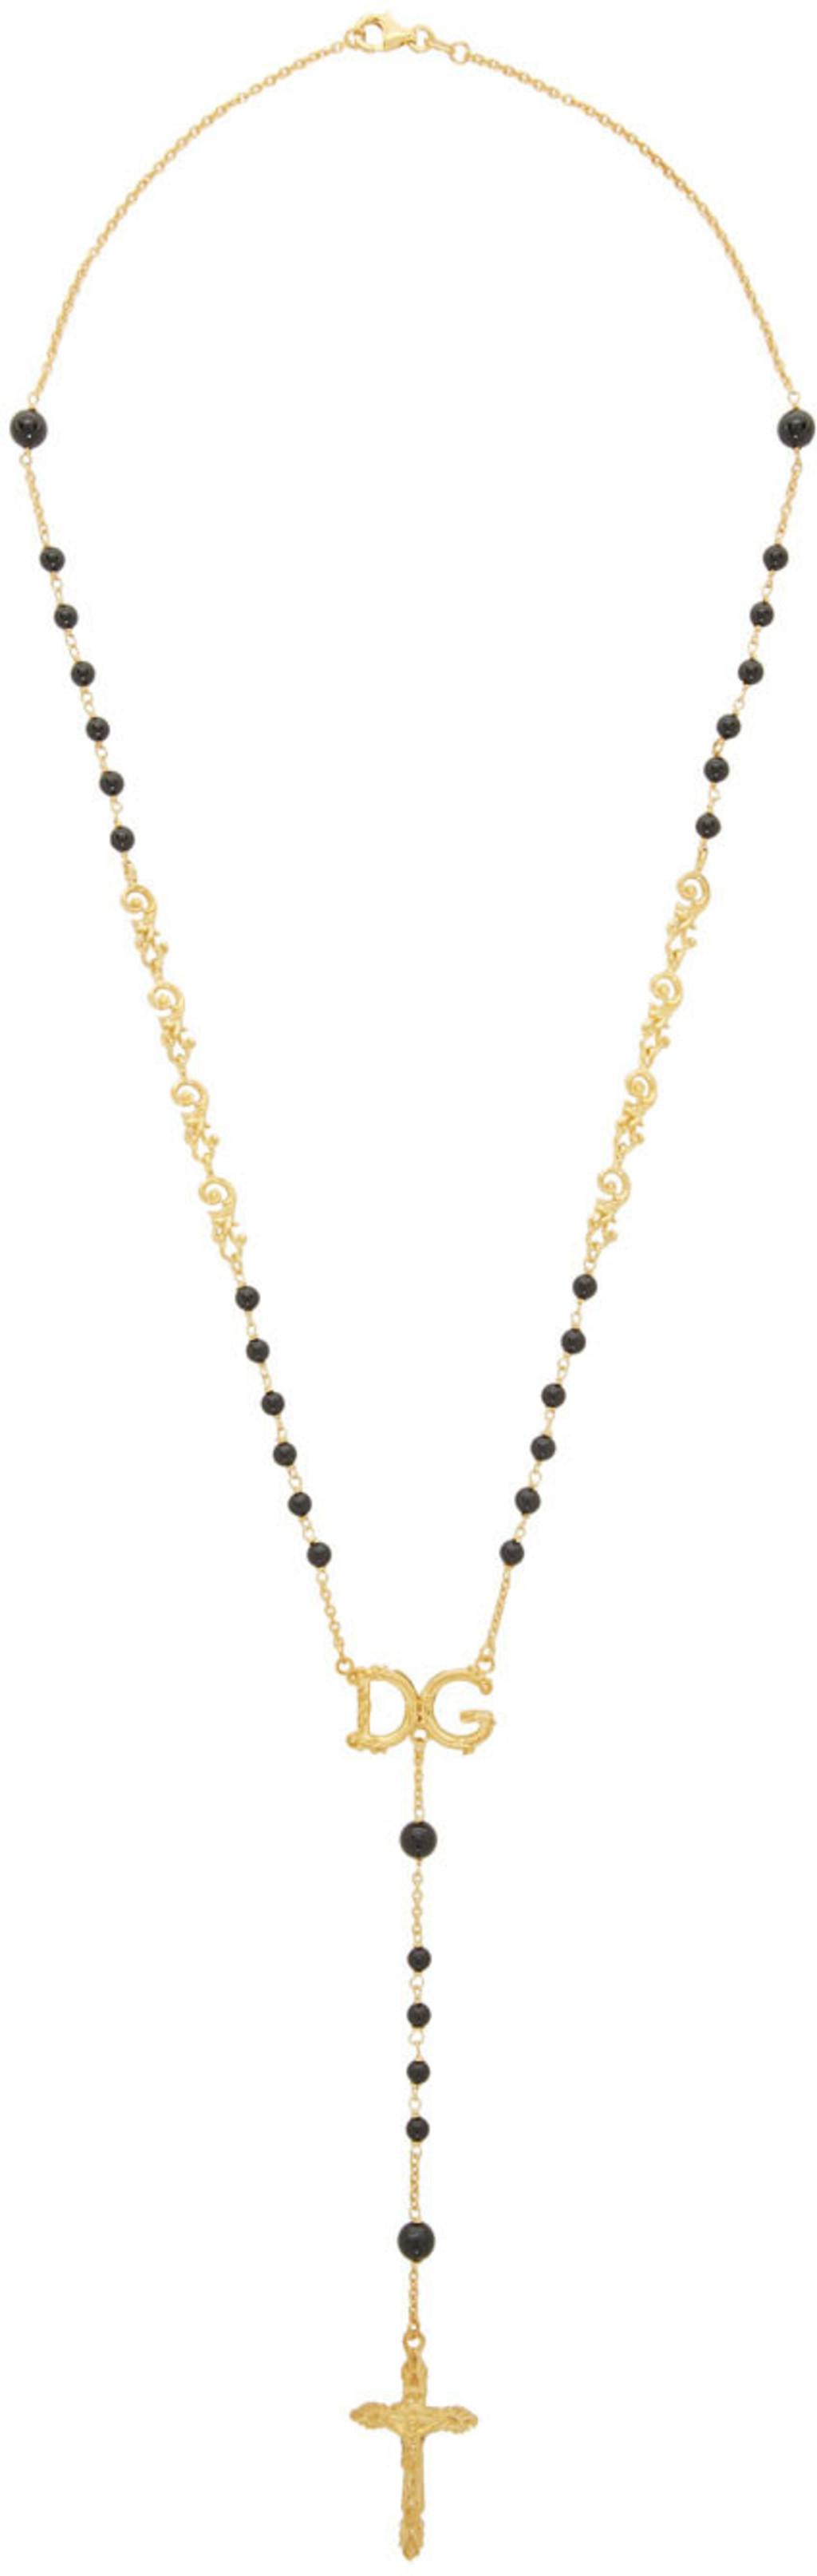 af8f222aea1a0 Black DG Rosary Necklace